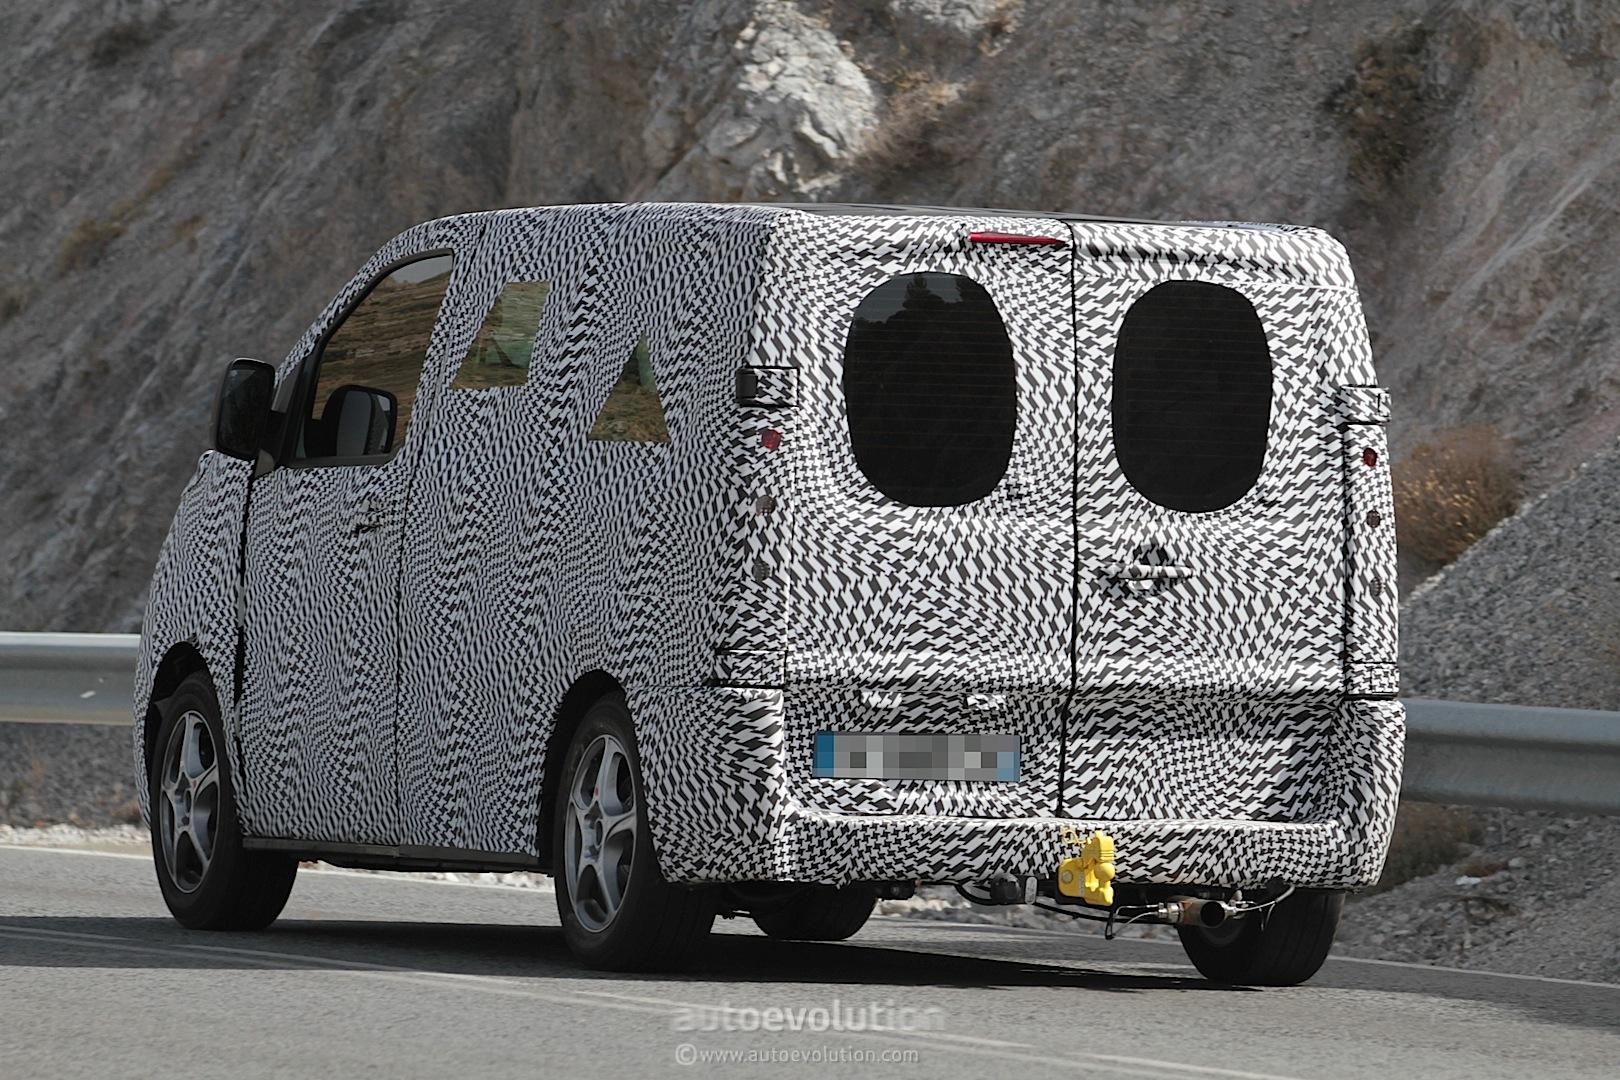 2016 - [Citroën/Peugeot/Toyota] SpaceTourer/Traveller/ProAce - Page 3 2016-citroen-jumpy-peugeot-expert-spied-photo-gallery_7